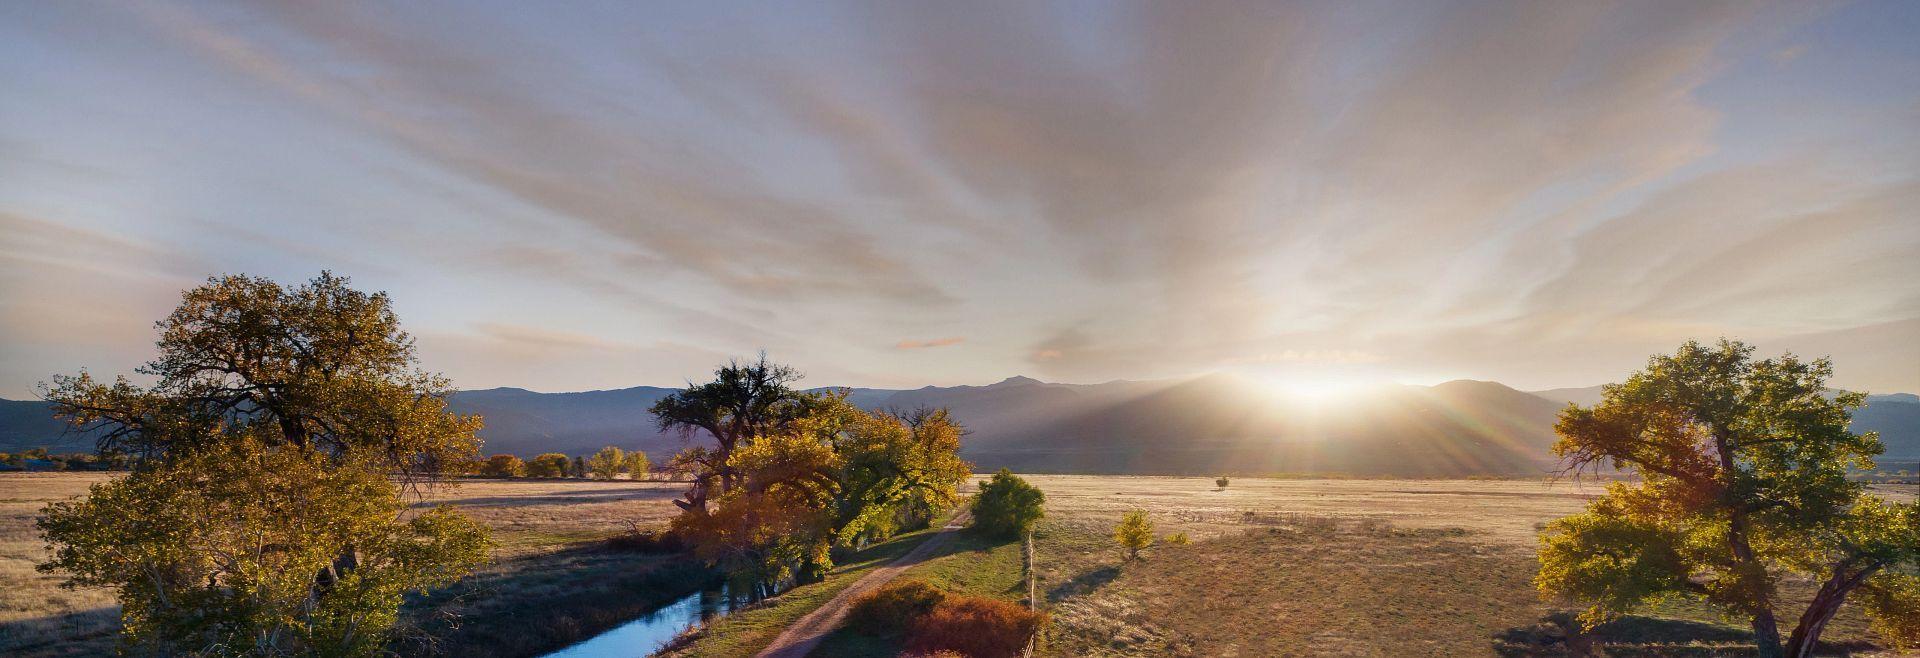 Solstice Lifestyle Mountains Sun Set:Solstice Sunset